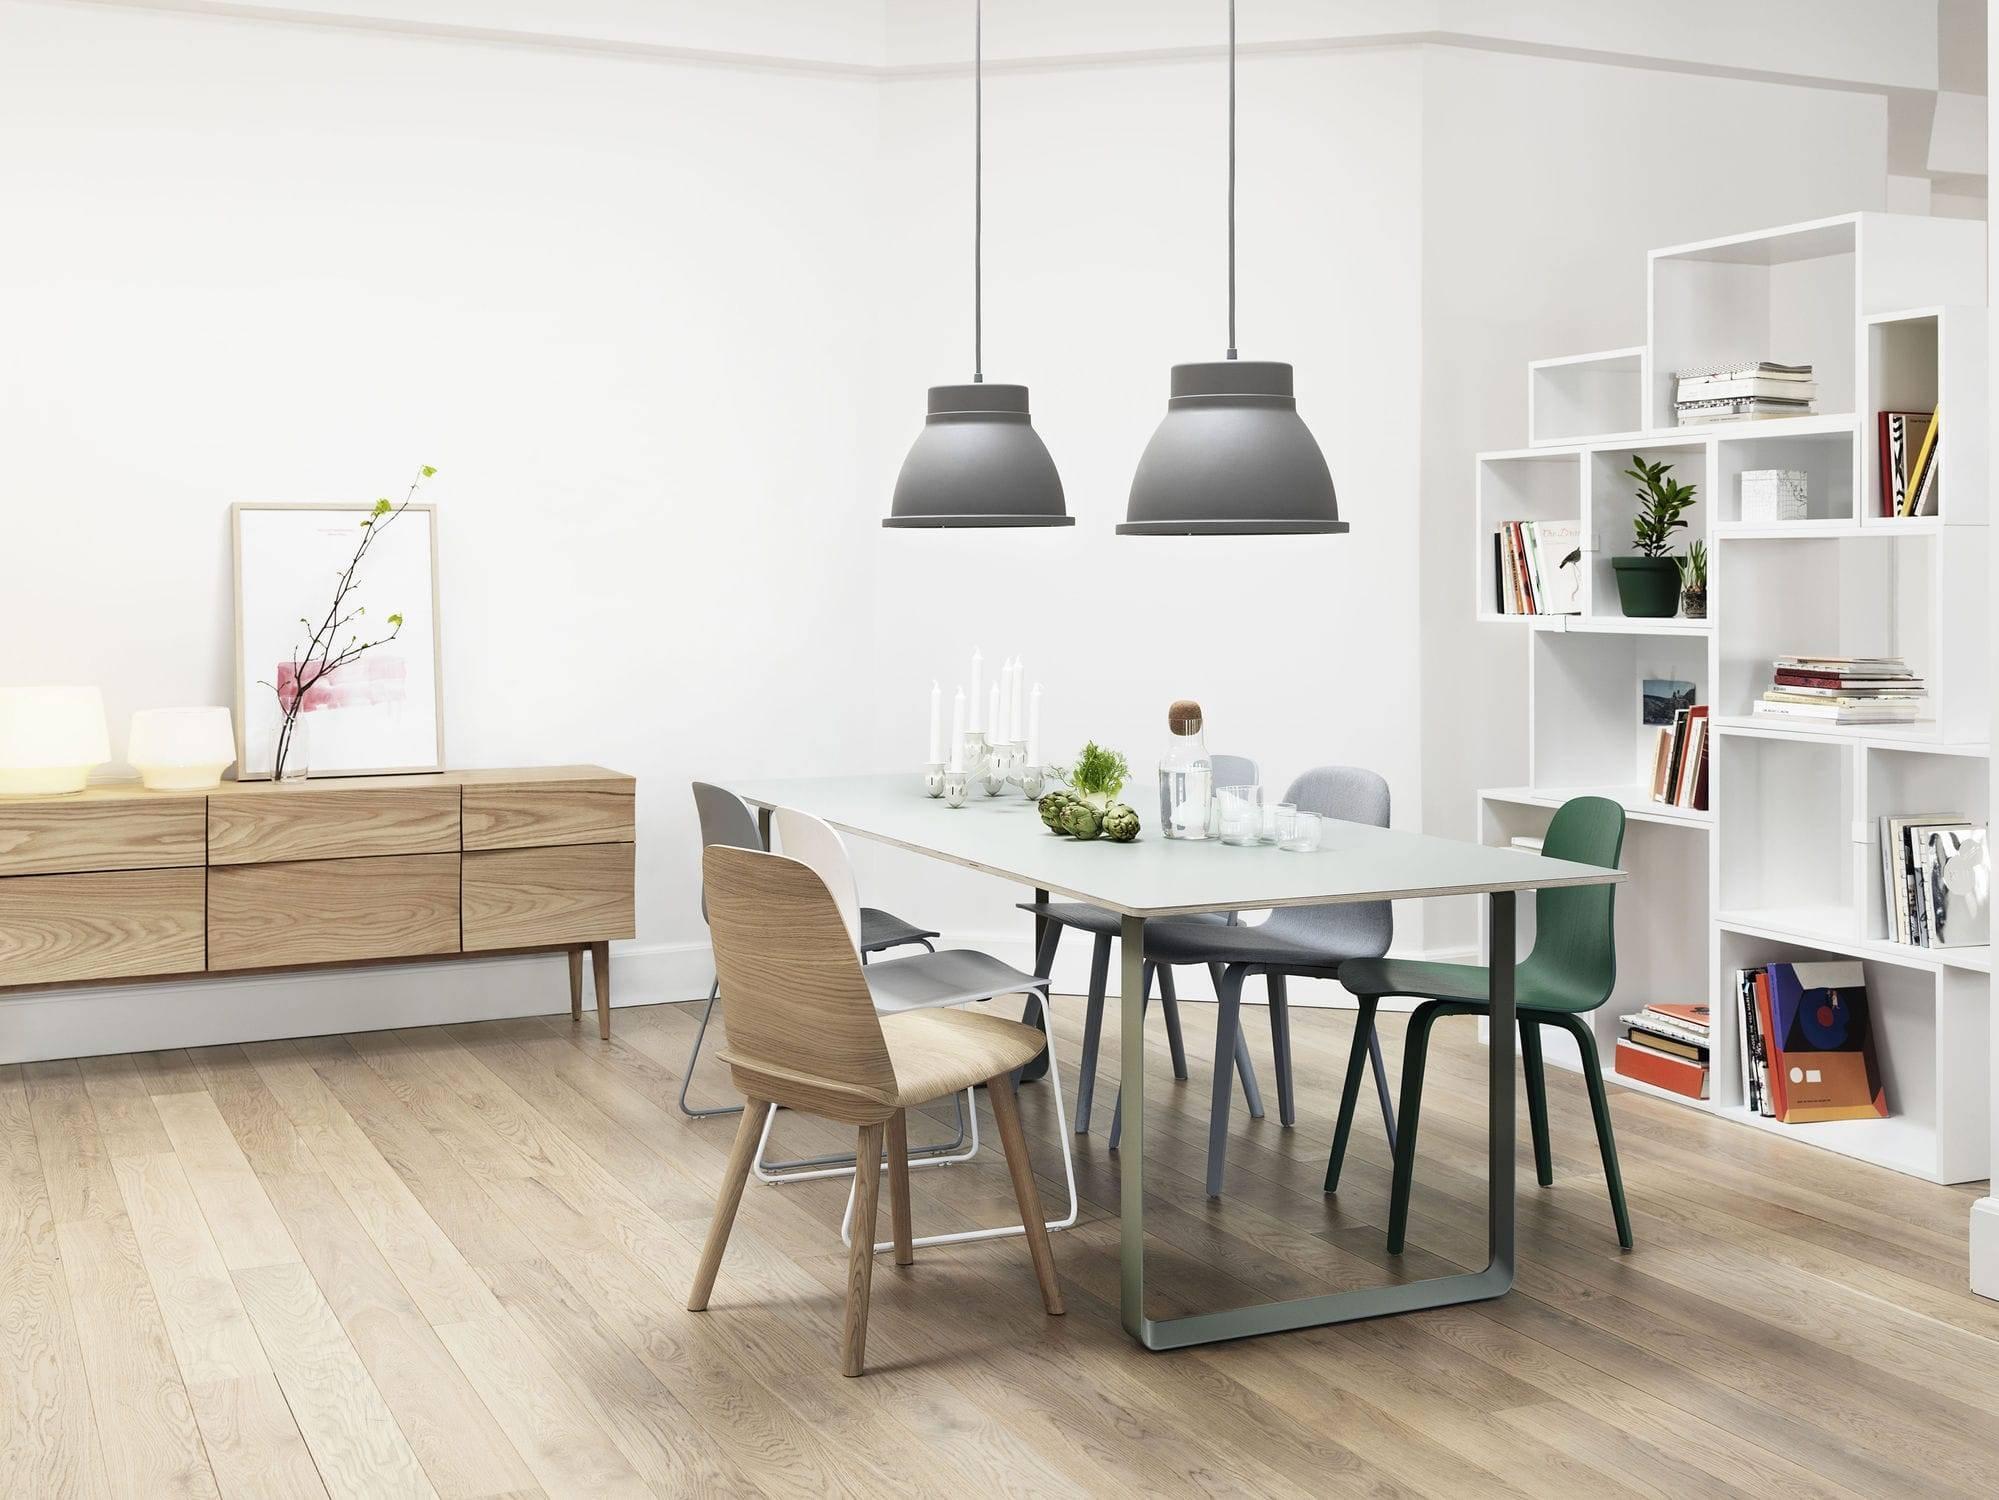 Scandinavian Design Sideboard / Oak – Reflectsøren Rose – Muuto Pertaining To Recent Scandinavian Sideboards (#7 of 15)